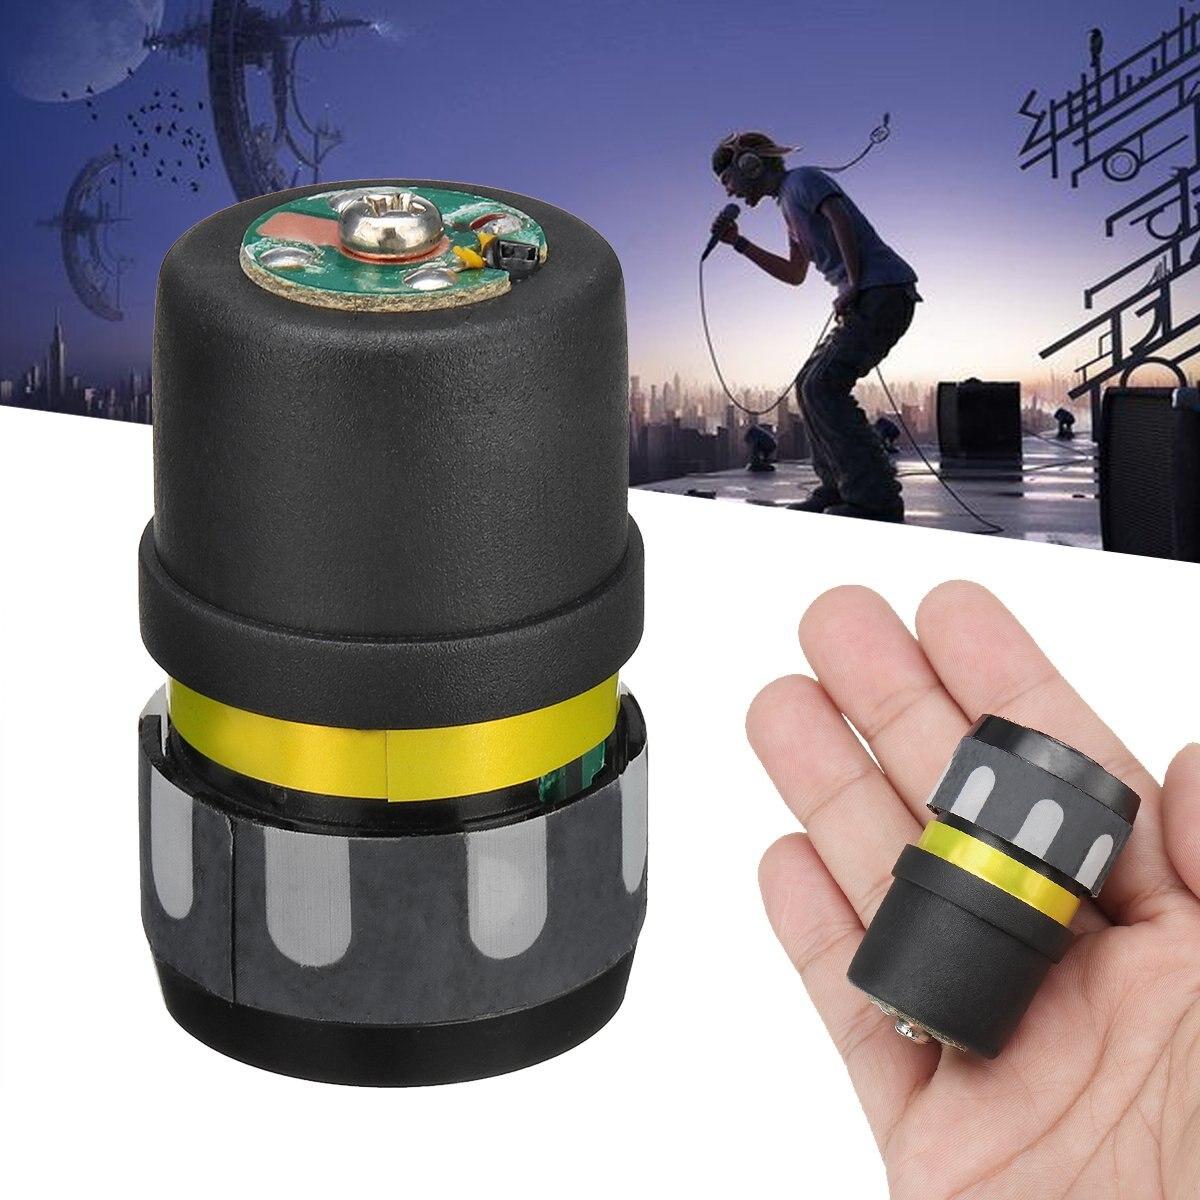 Reemplazo de cartucho de micrófono dinámico, núcleo de cápsula de micrófono para reparación de micrófono inalámbrico